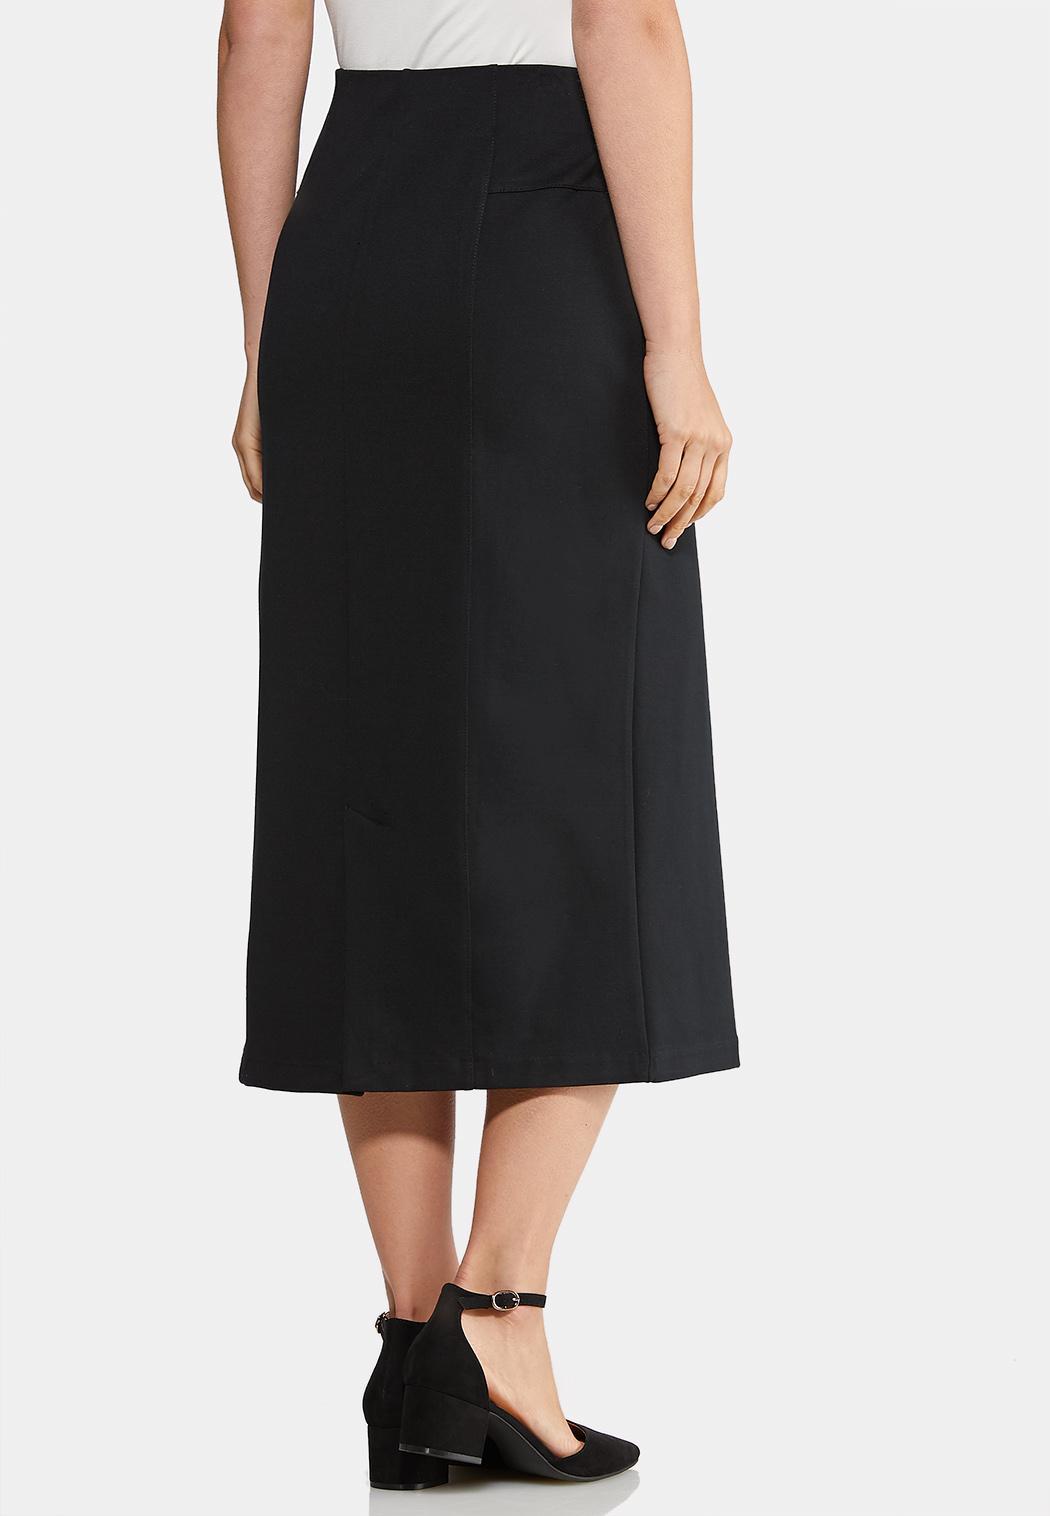 Ponte Long Midi Skirt (Item #43955436)